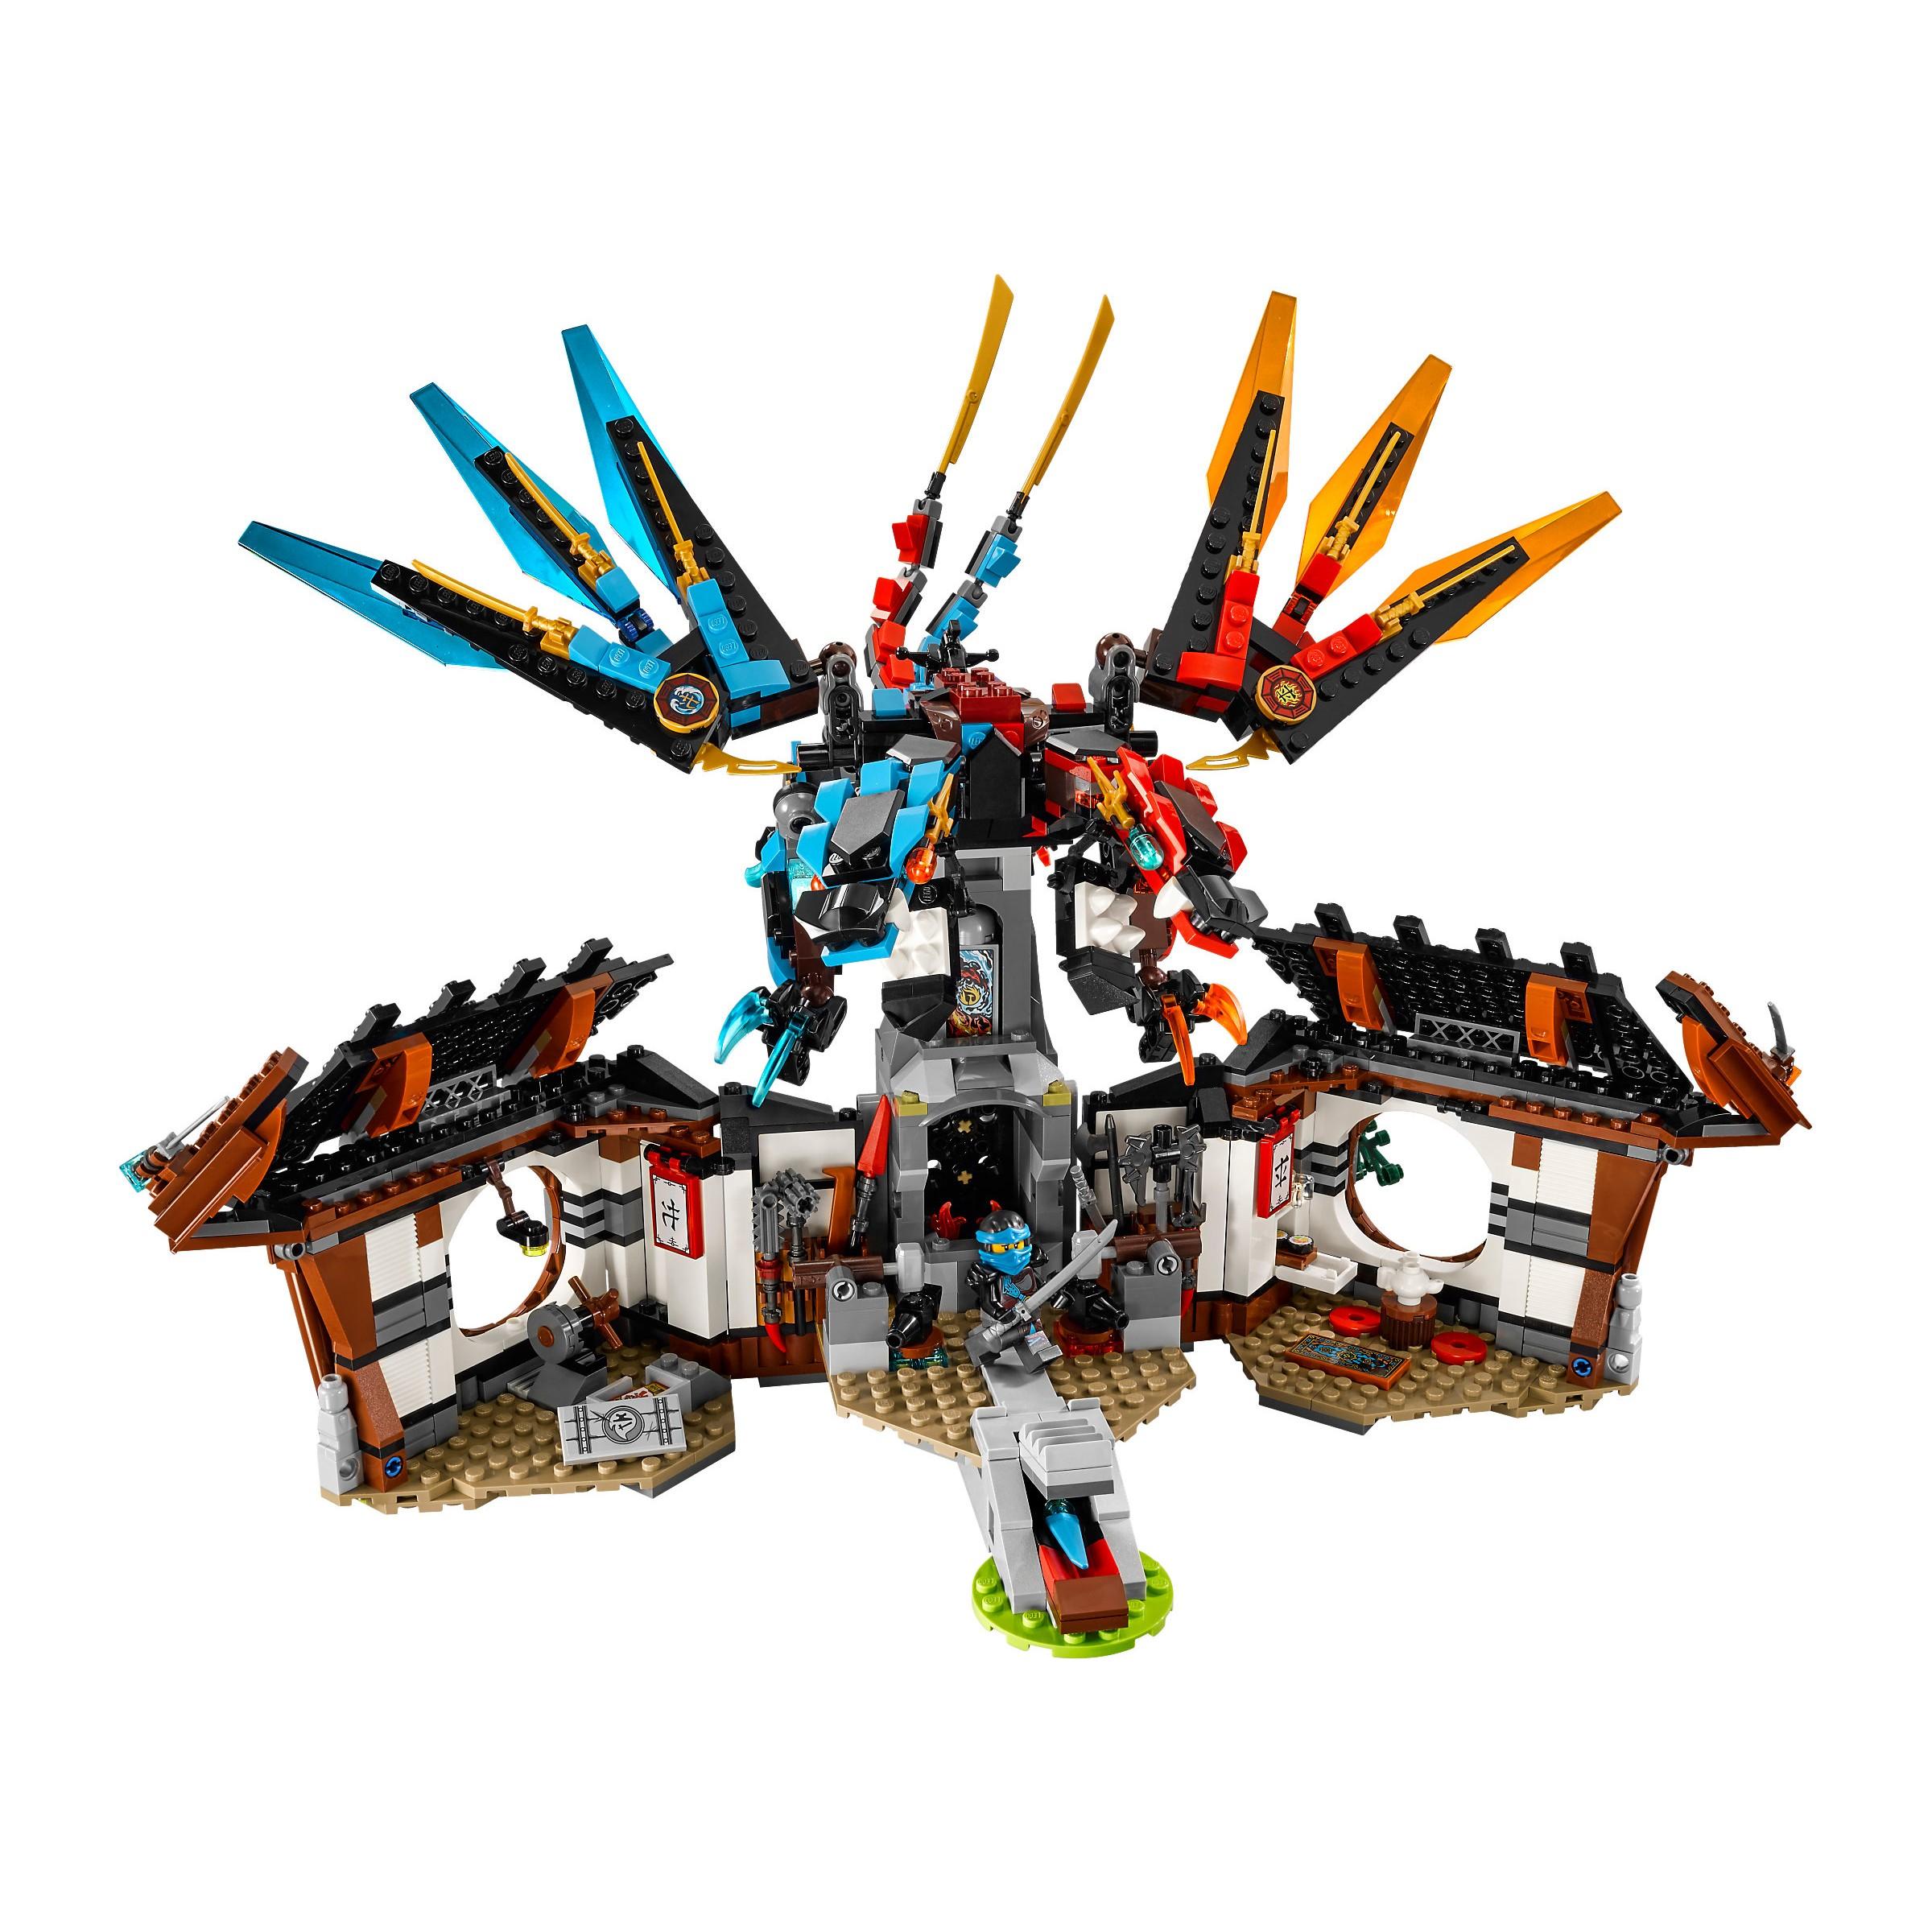 lego 70627 ninjago dragon 39 s forge at hobby warehouse. Black Bedroom Furniture Sets. Home Design Ideas